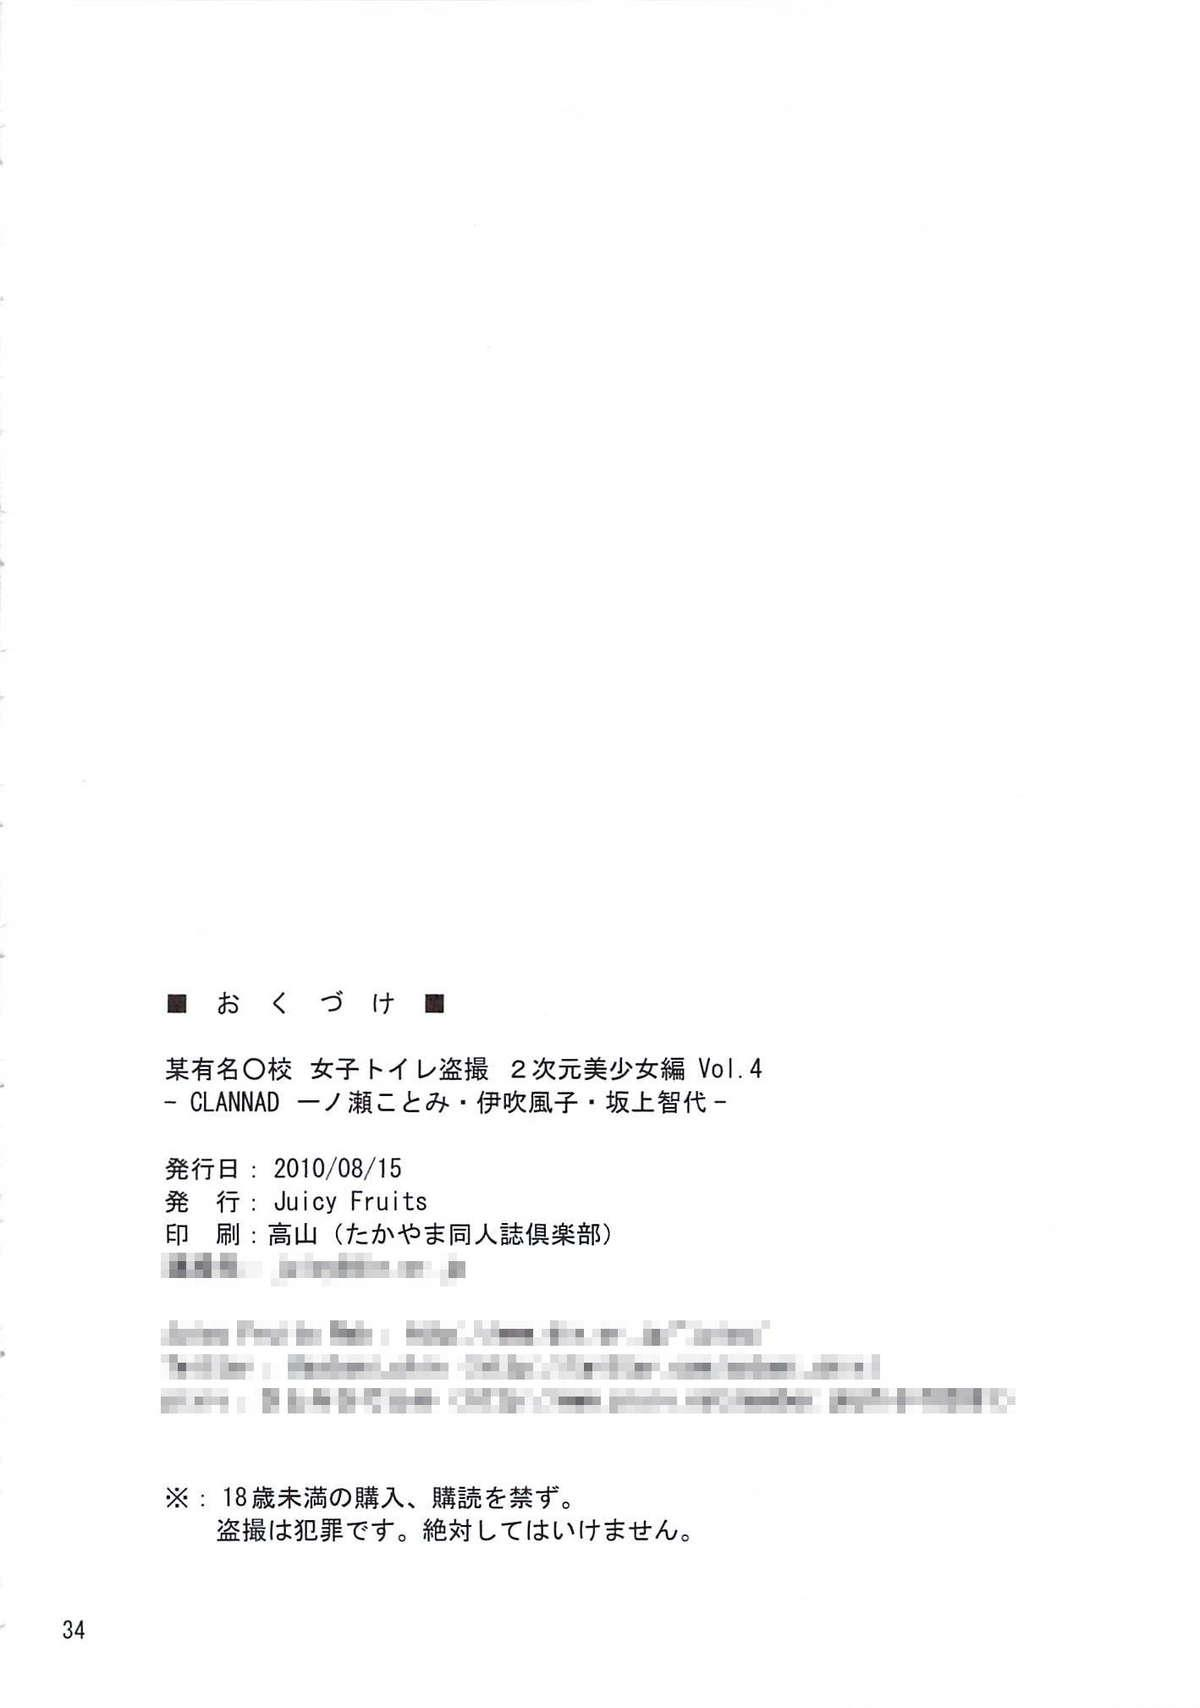 Bou Yuumei Koukou Joshi Toilet Tousatsu 2-jigen Bishoujo Hen Vol. 4 32